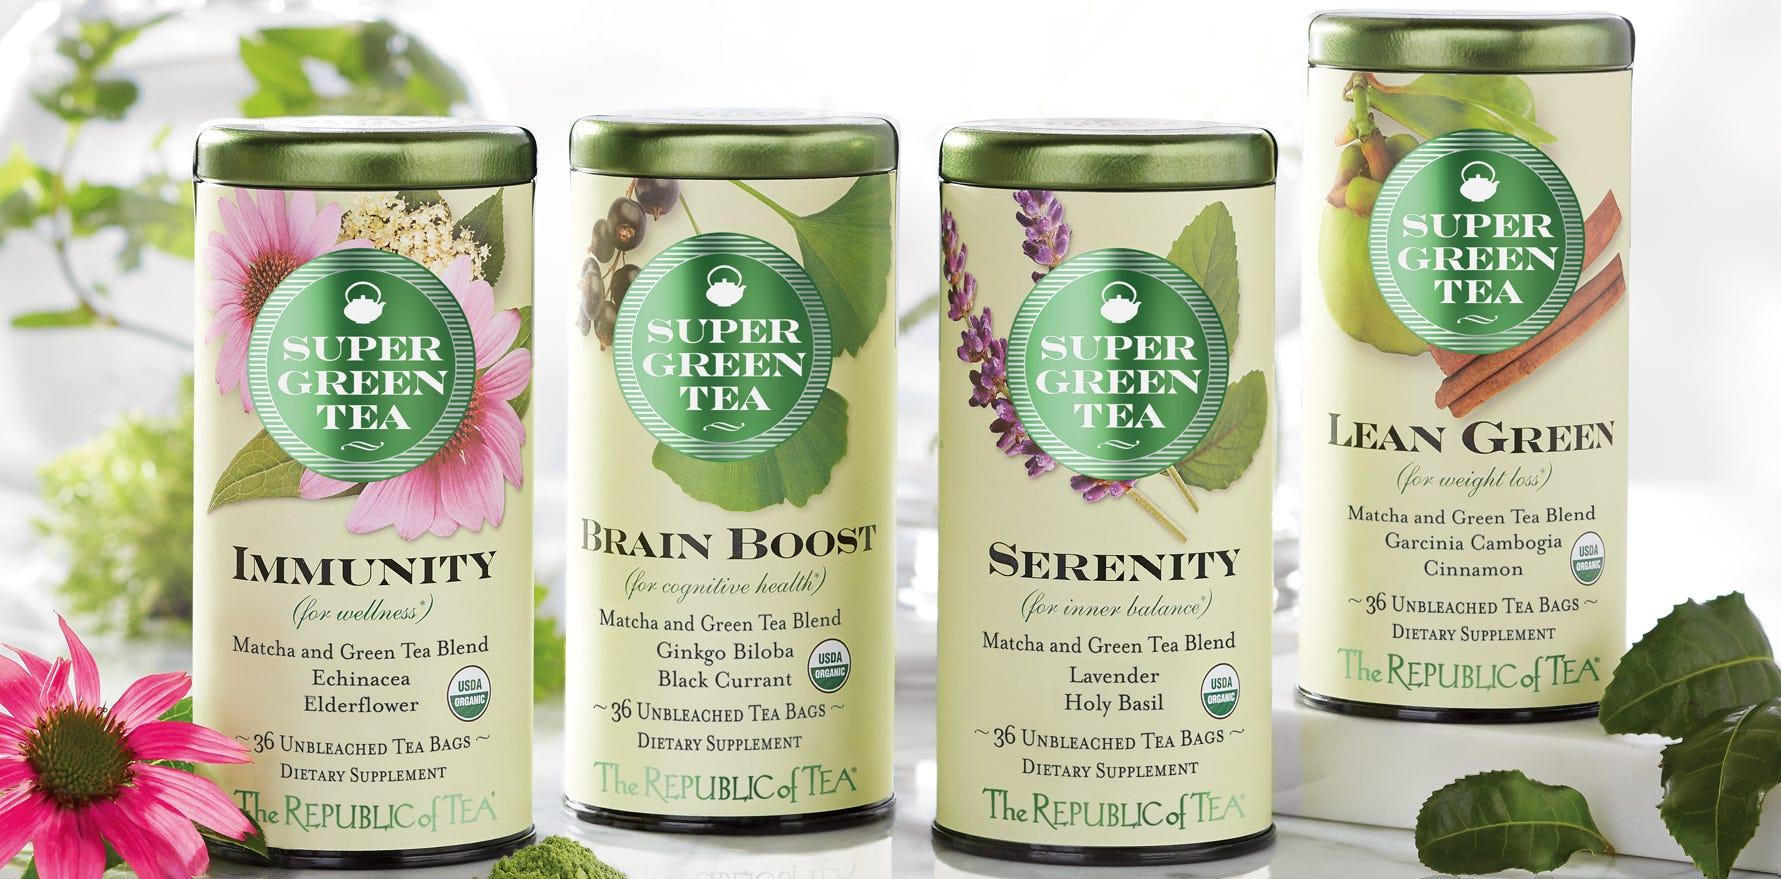 An assortment of teas from The Republic of Tea.